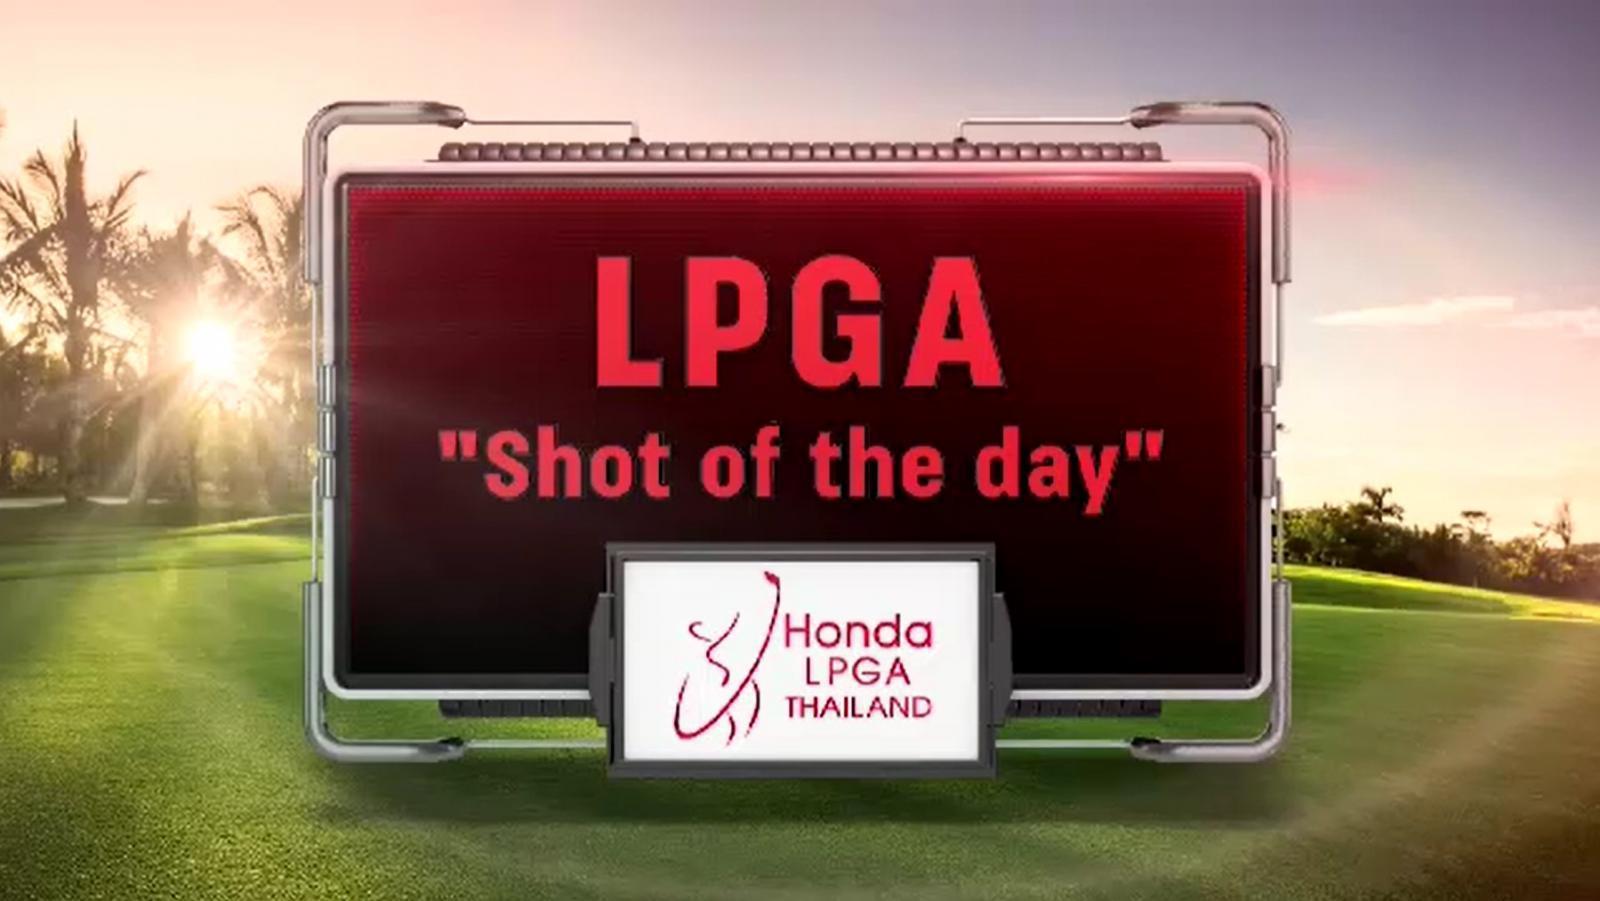 LPGA shot of the day ประจำวันที่ 9 พ.ค. 64